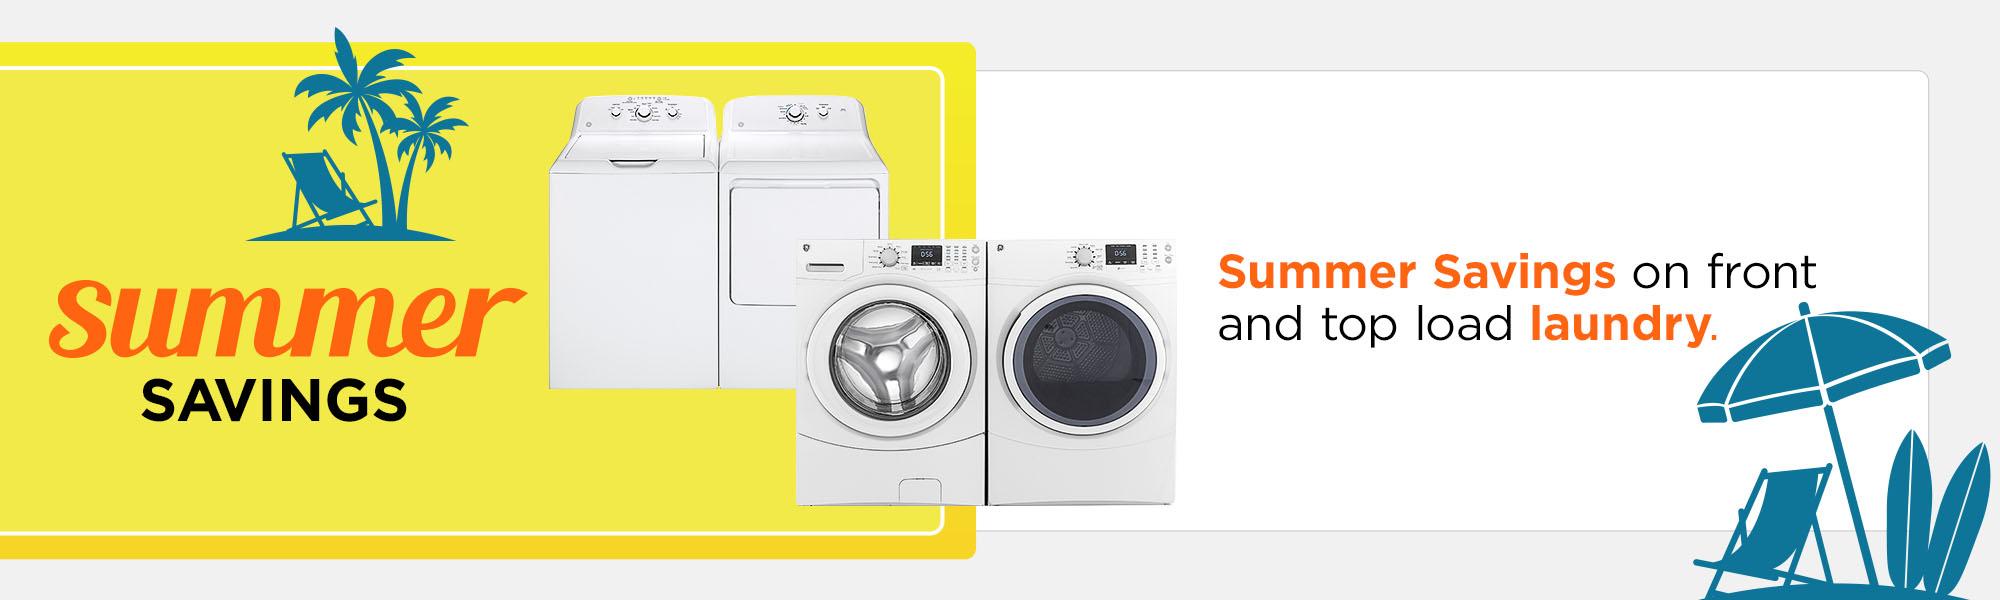 Summer Savings for Laundry